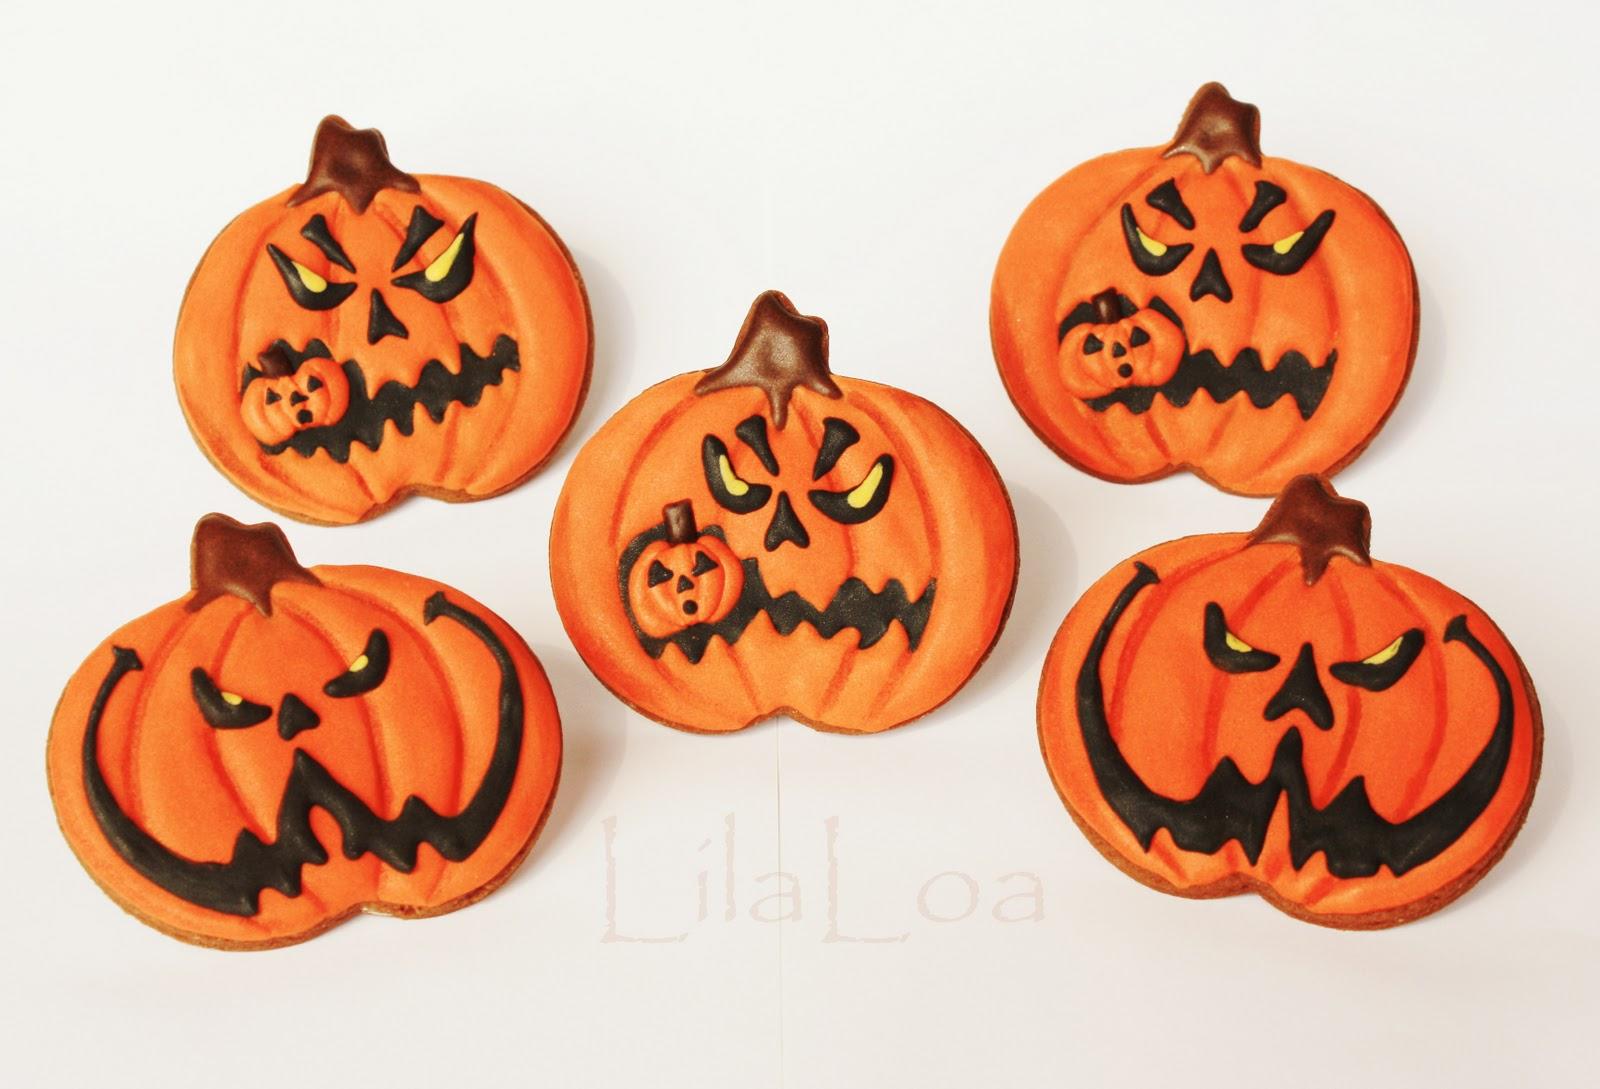 Jack-O-Lantern Cookies | LilaLoa: Scarier Jack-O-Lantern Cookies